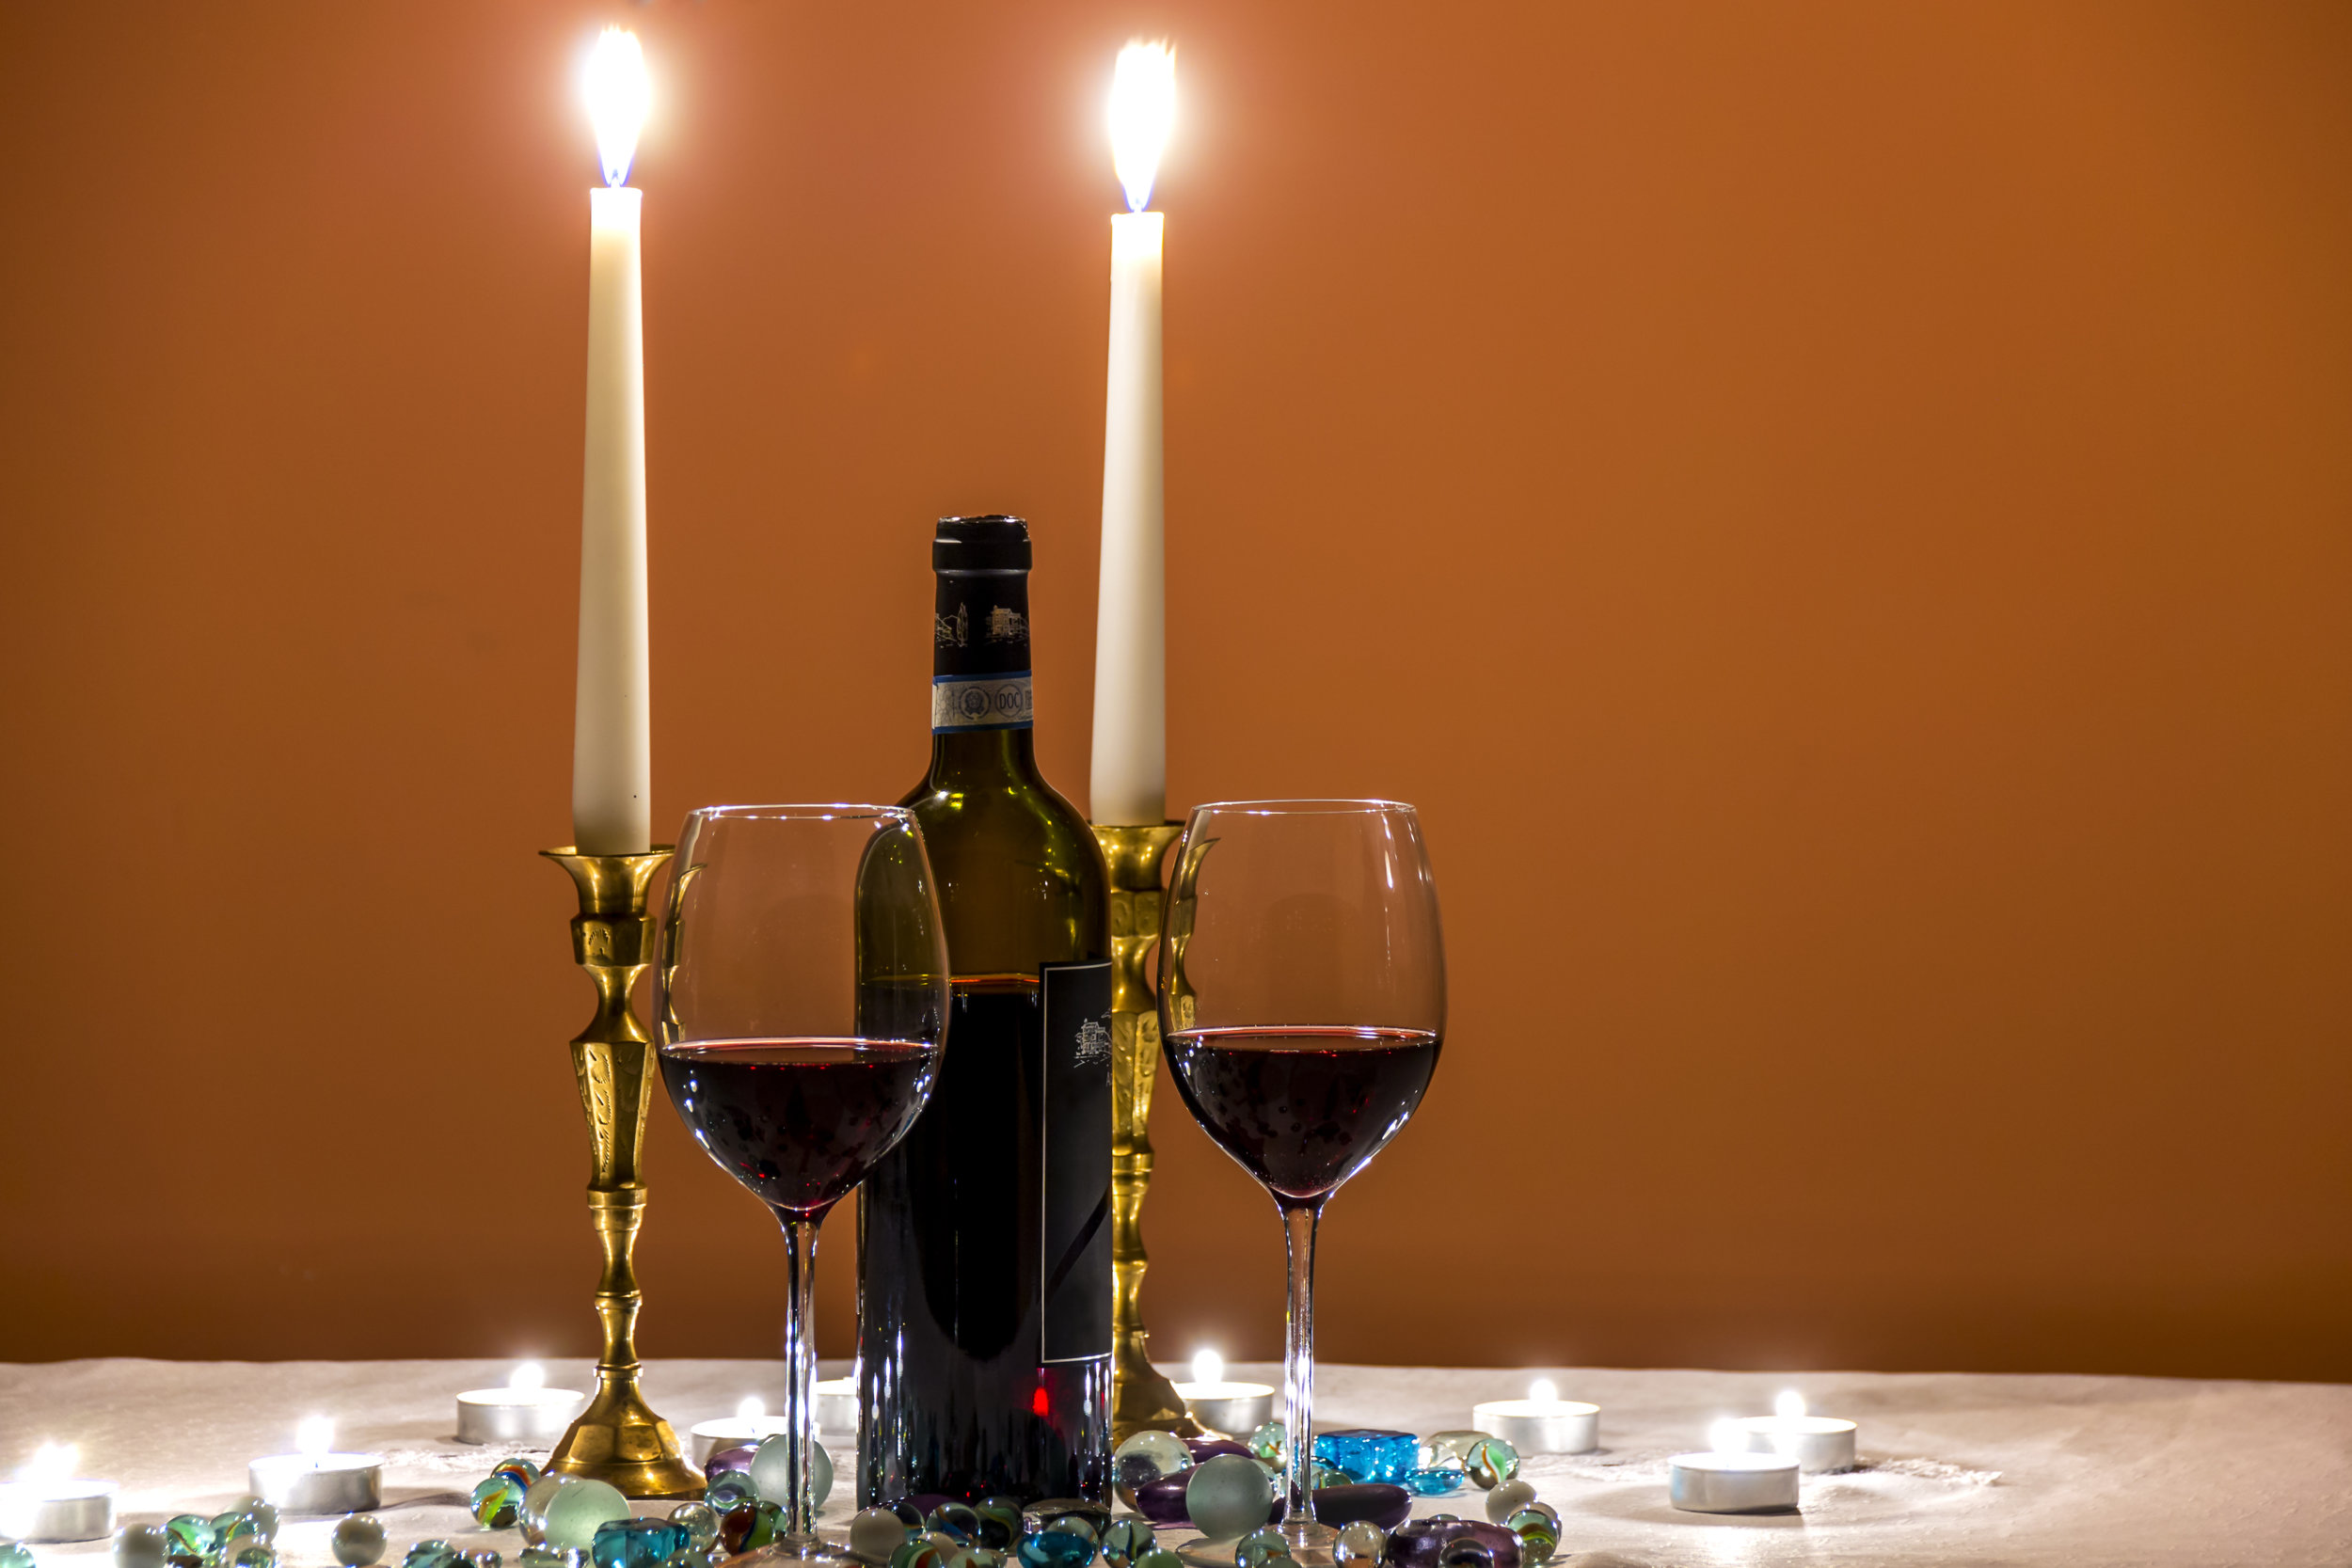 Romantic evening with wine